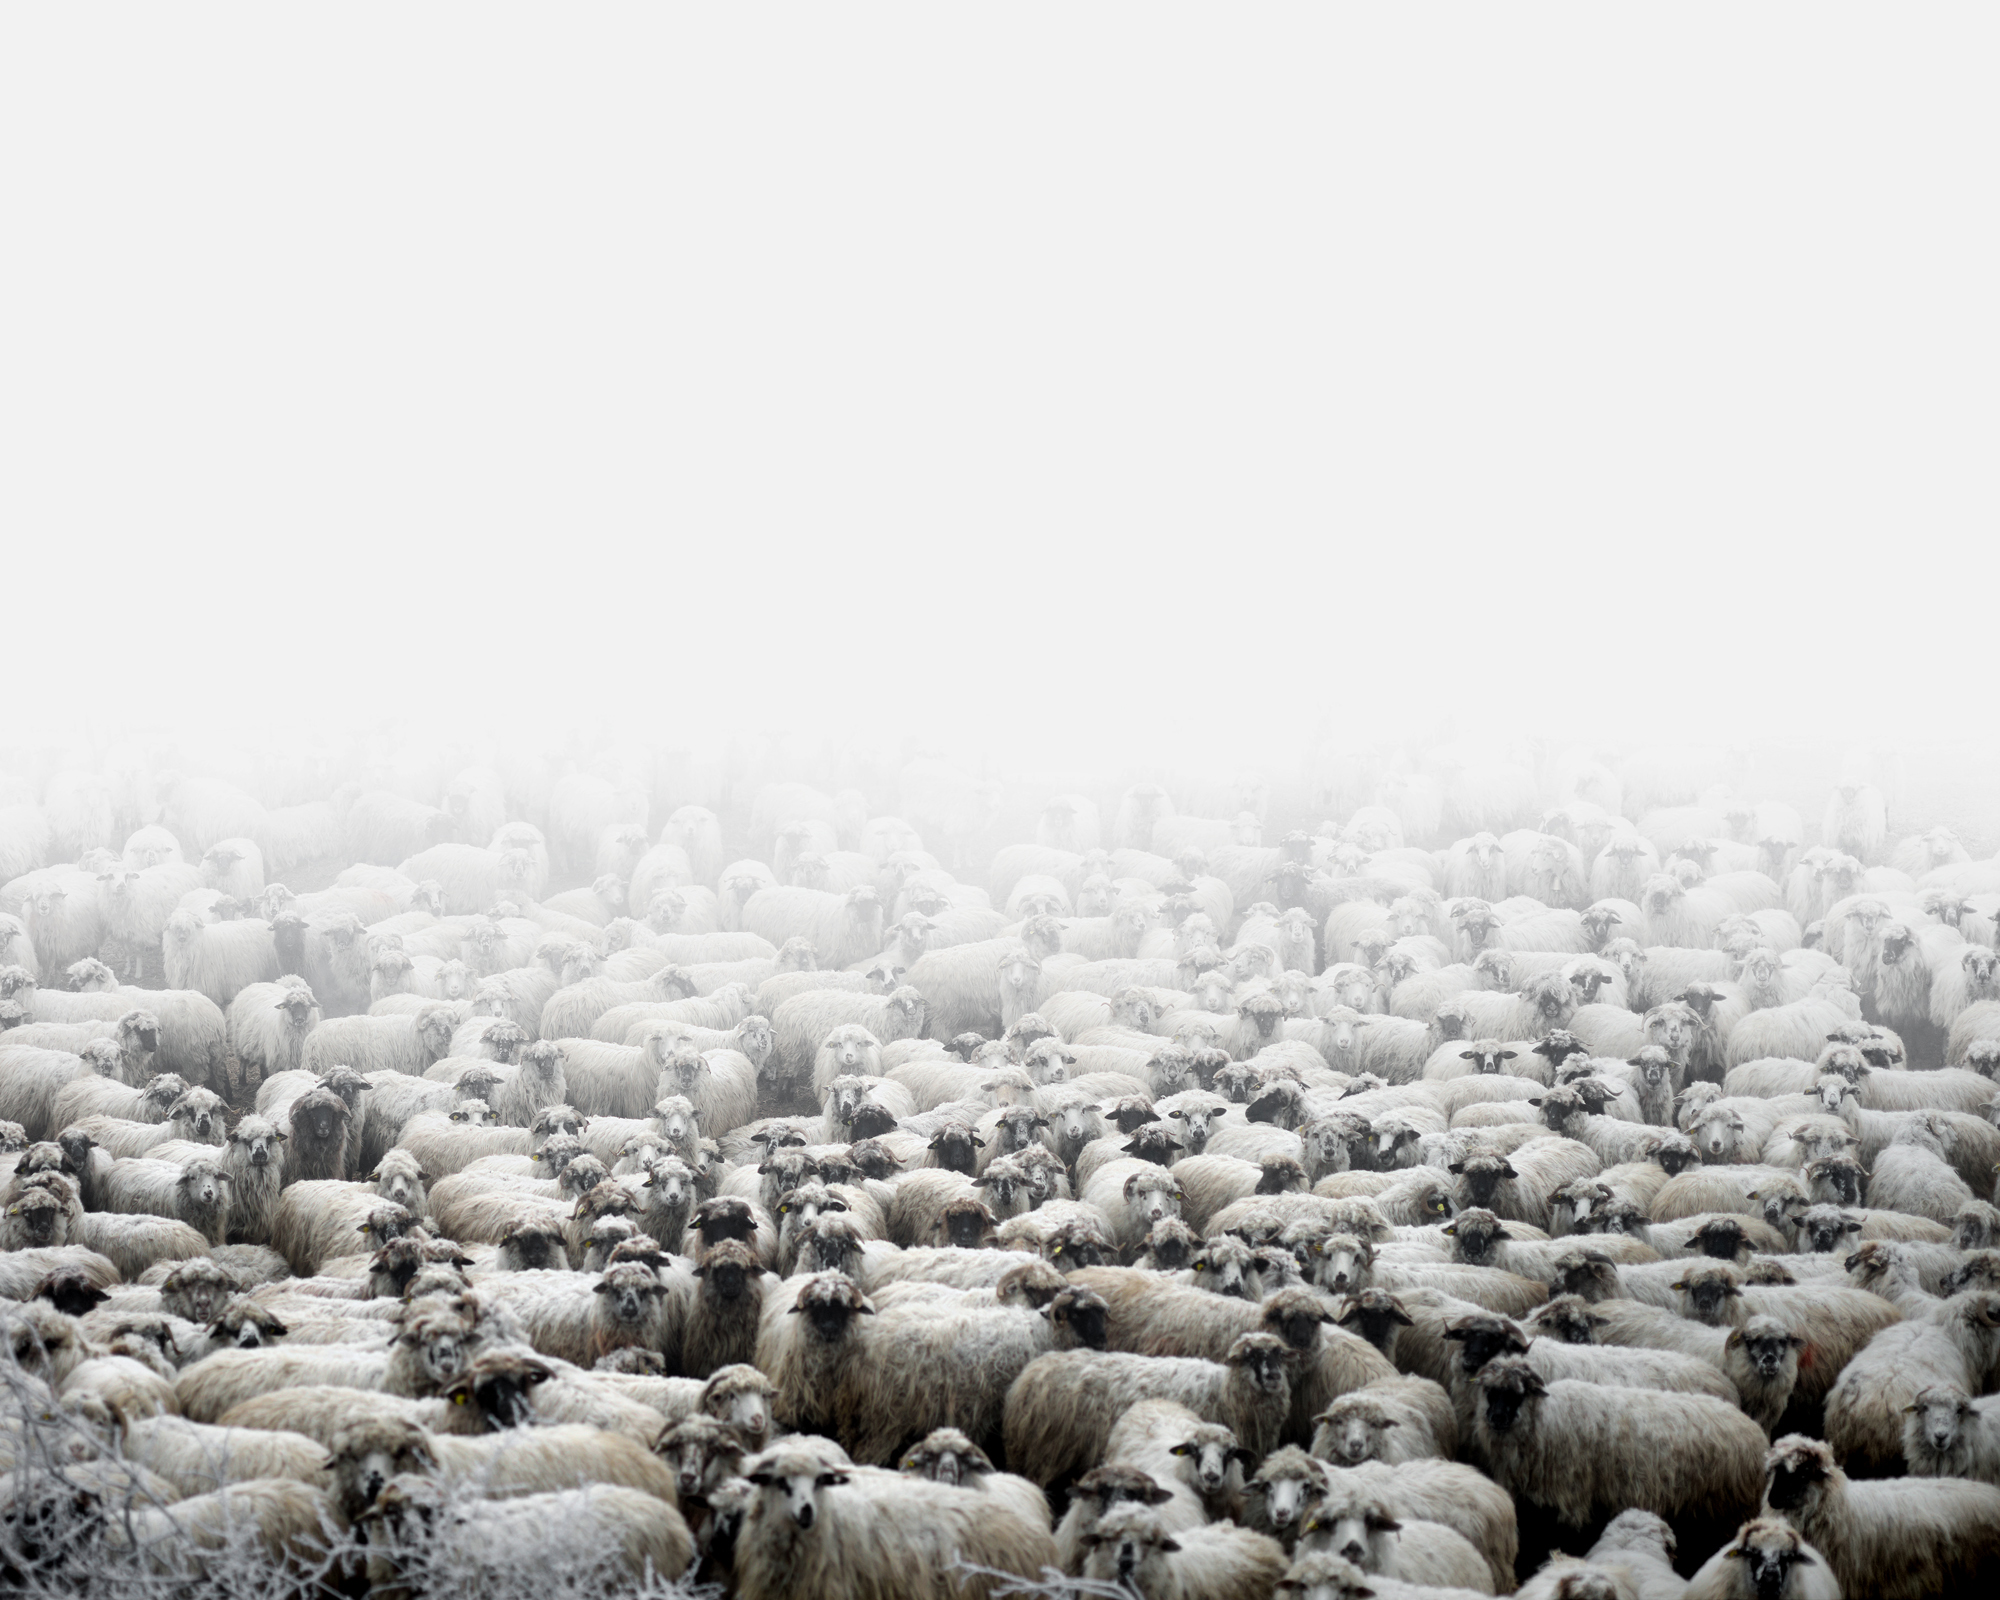 Sheep farm (Silvasu de Sus, West Romania), 2011